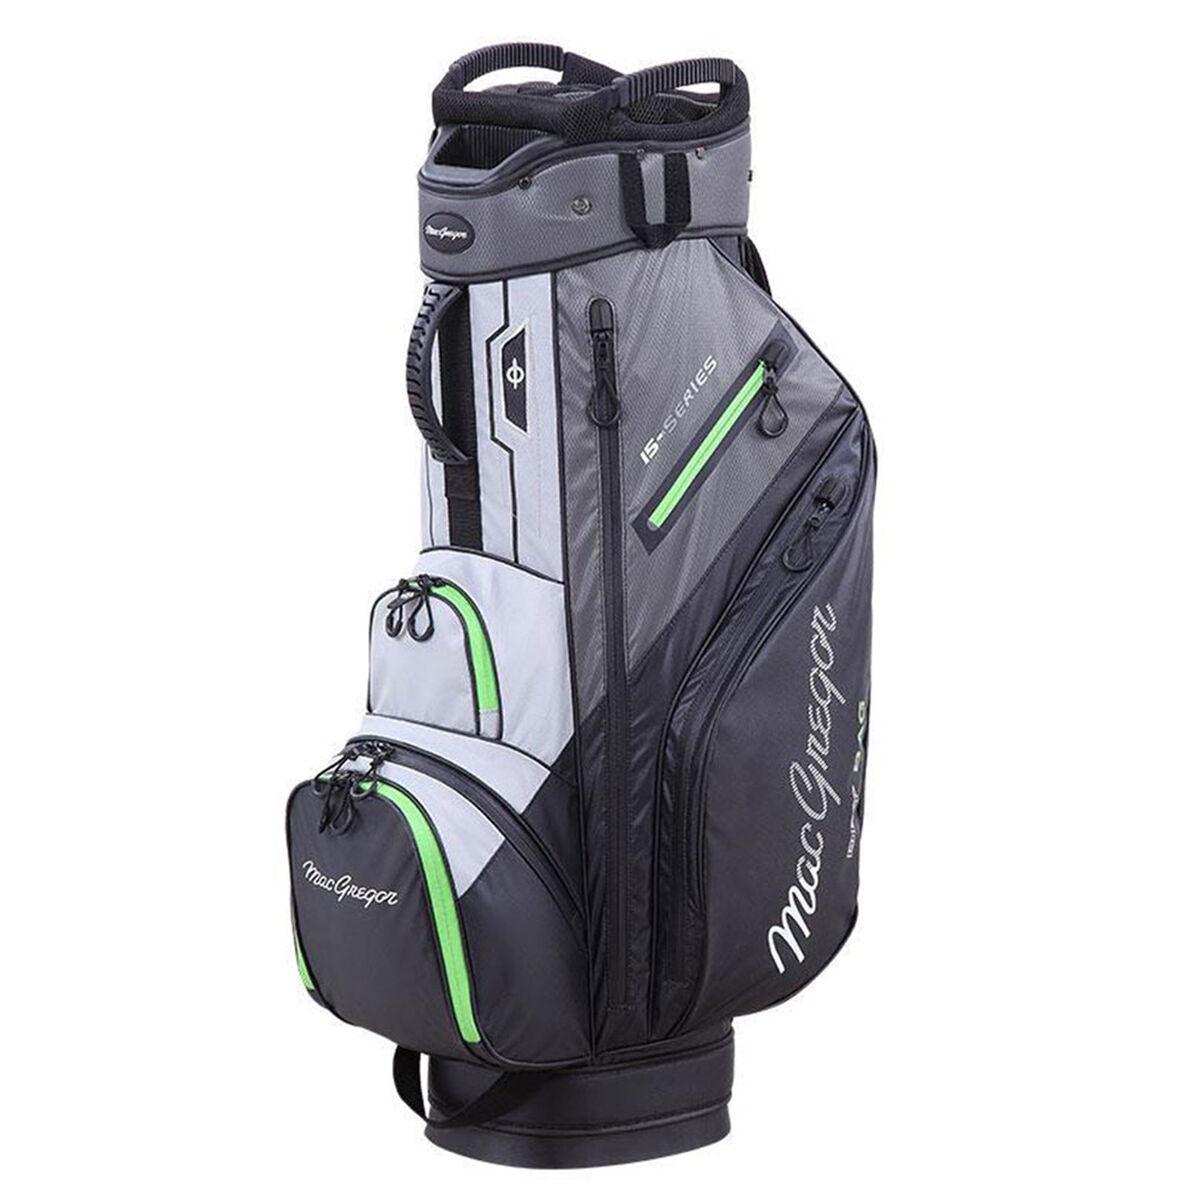 MacGregor 15-Series Water-Resistant Golf Cart Bag, Black/grey   American Golf